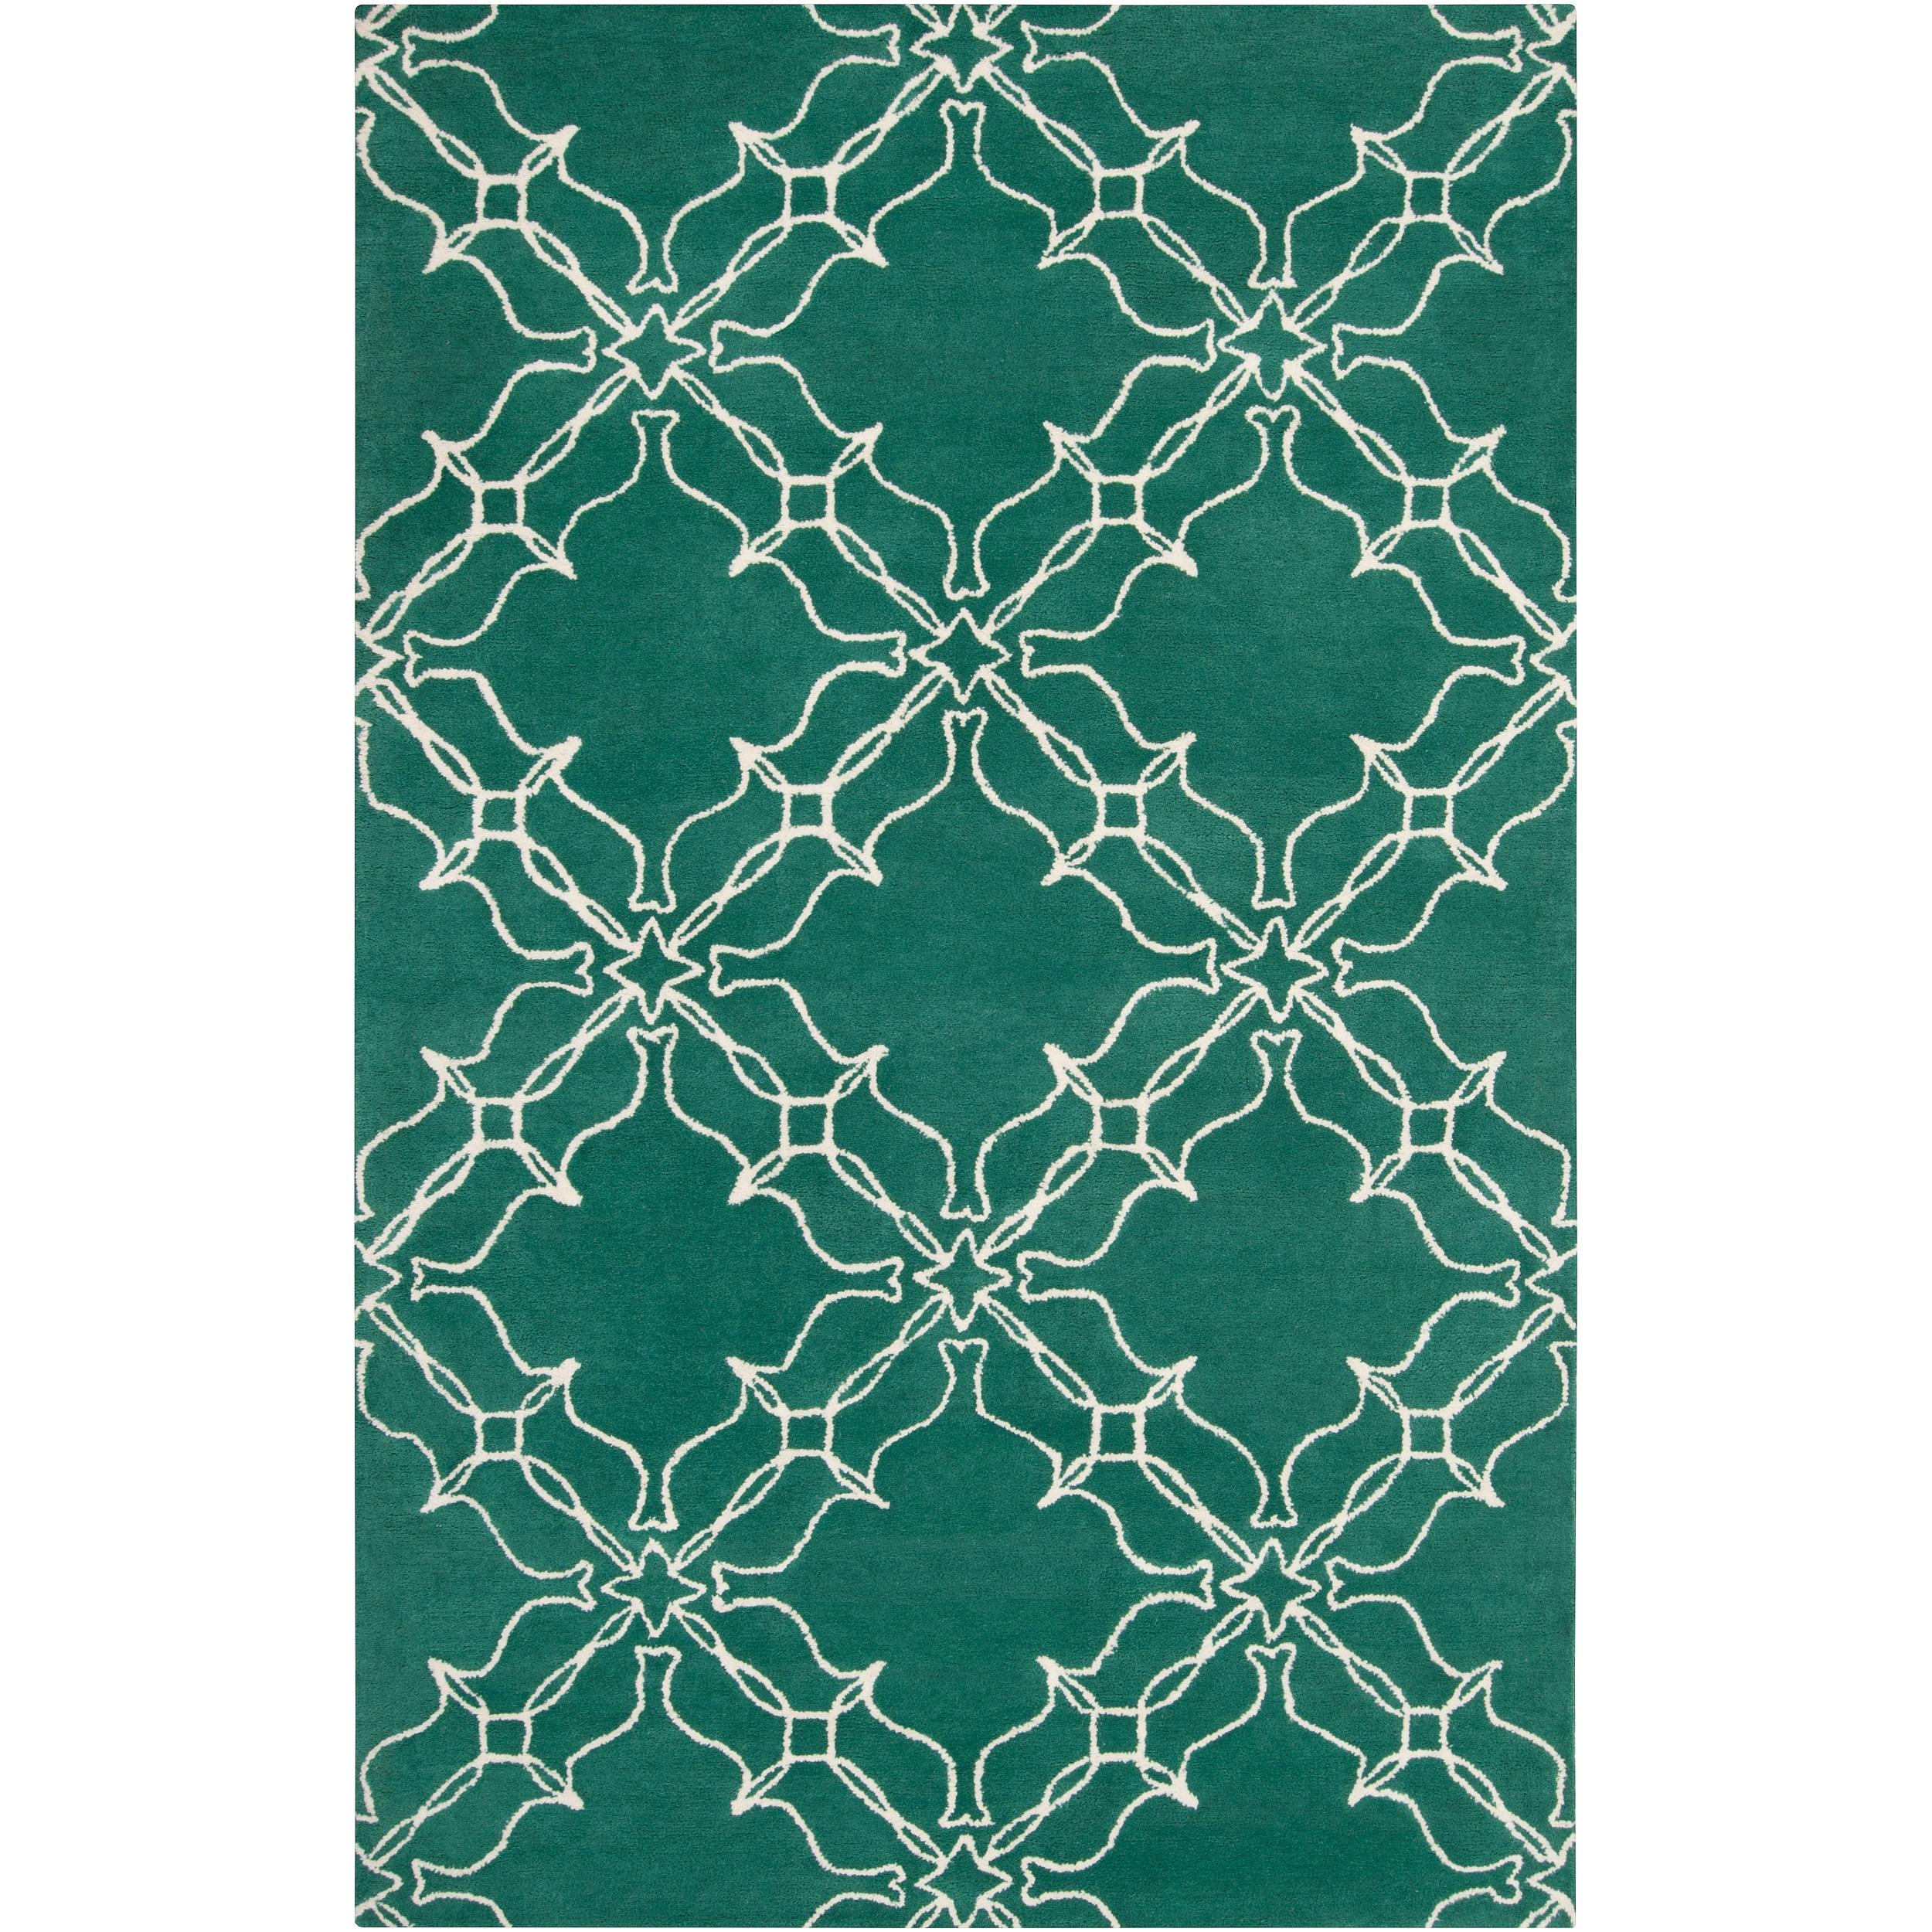 Aimee Wilder Hand-tufted Granada Emerald Green Geometric